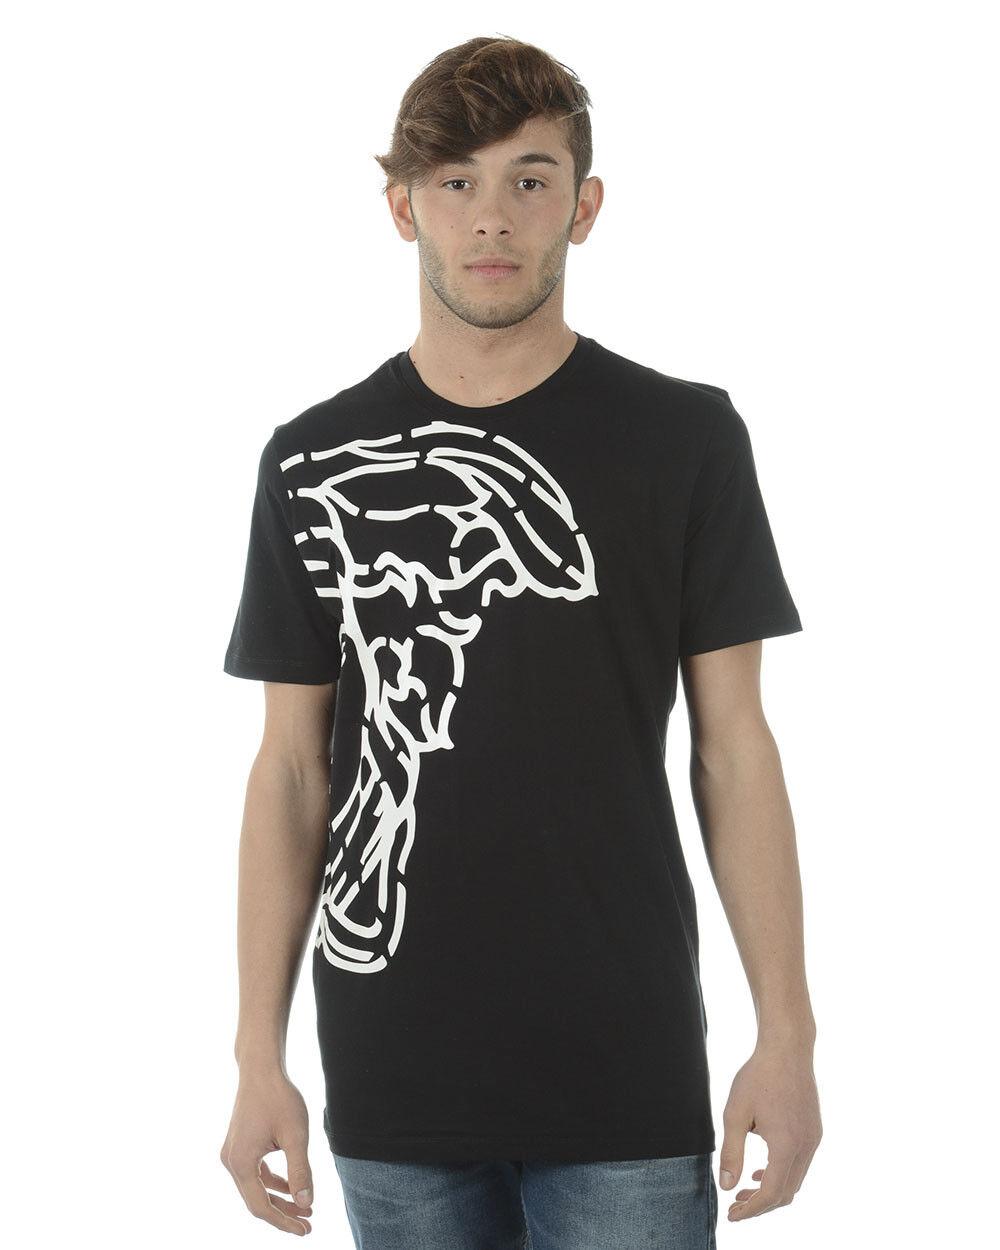 VERSACE COLLECTION T Shirt Sweat-shirt coton homme noir V800683SVJ00359 V7008